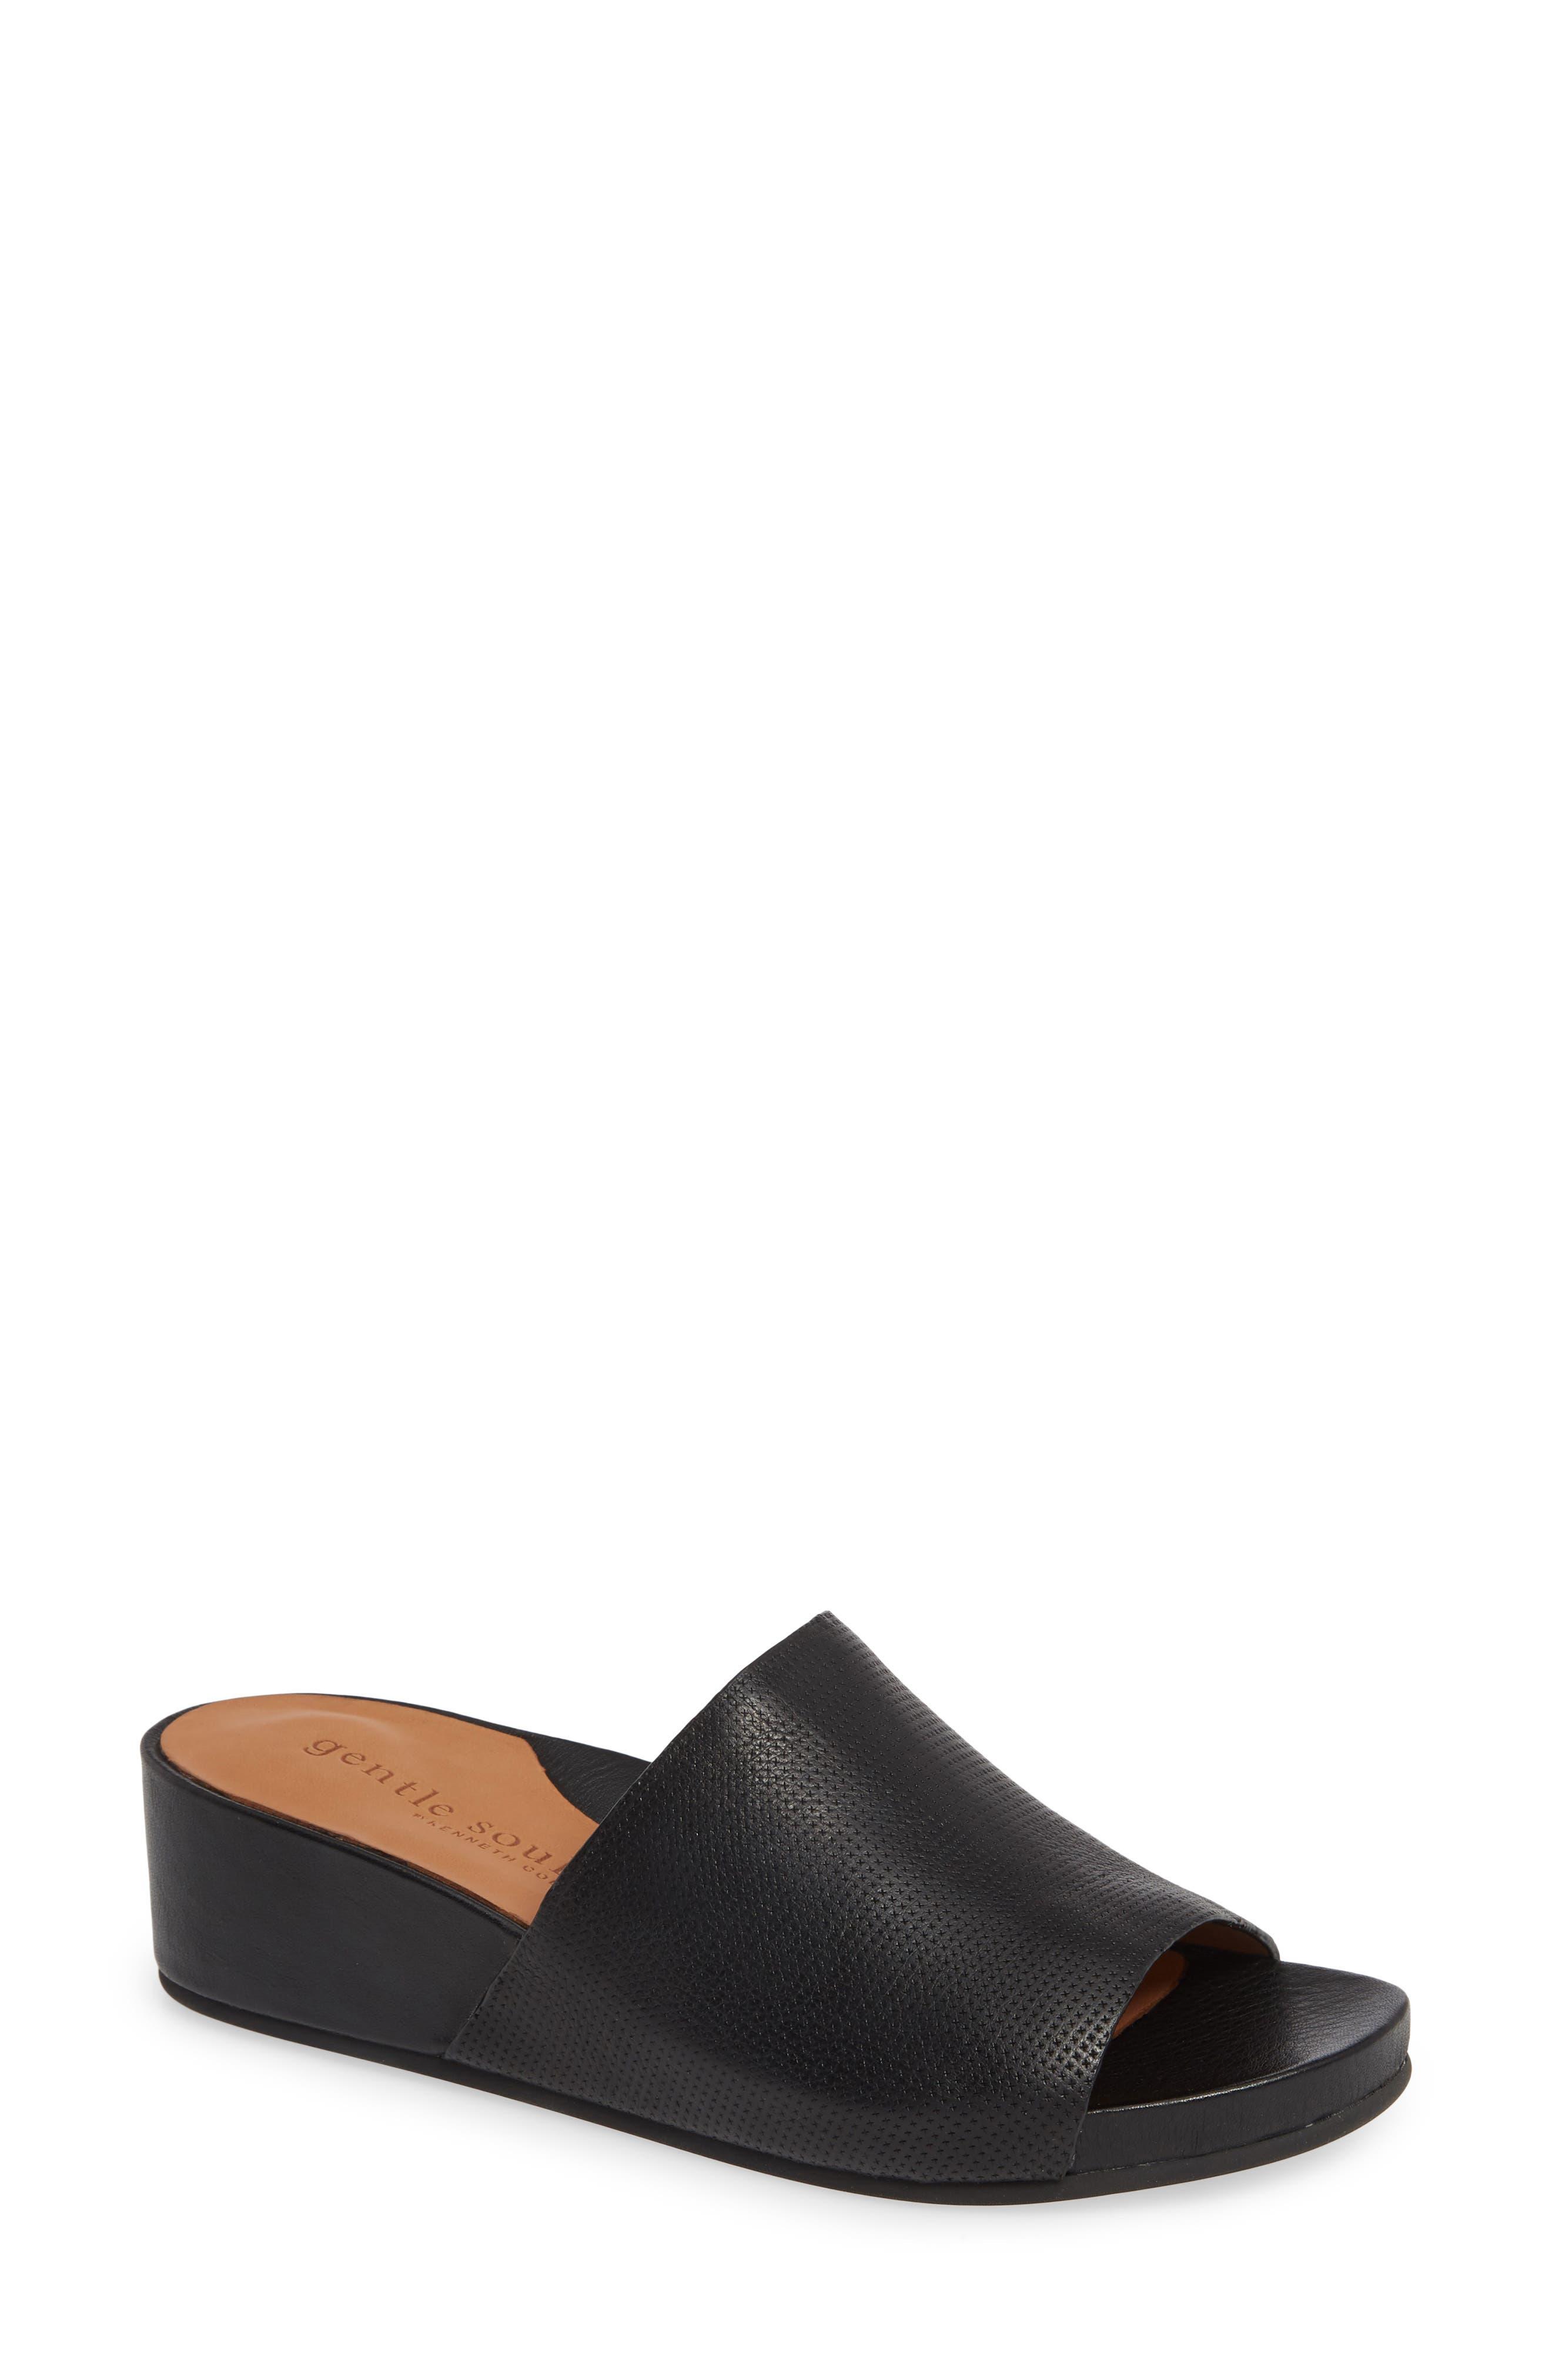 Gisele Wedge Slide Sandal,                             Main thumbnail 1, color,                             BLACK LEATHER